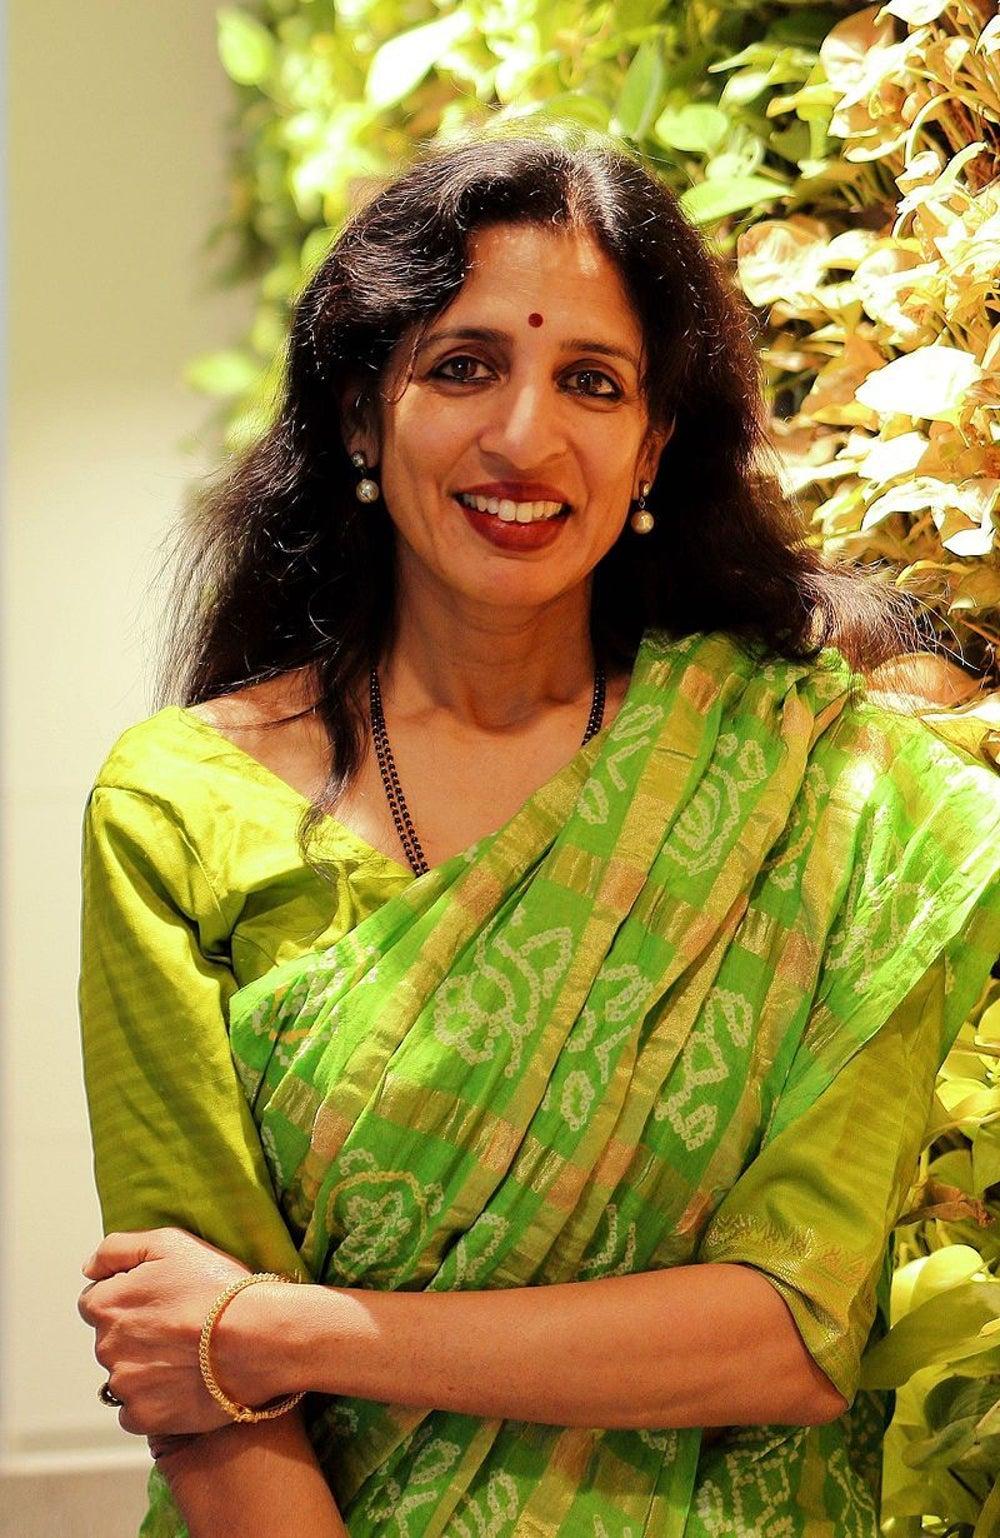 #8 - Jayshree Ullal